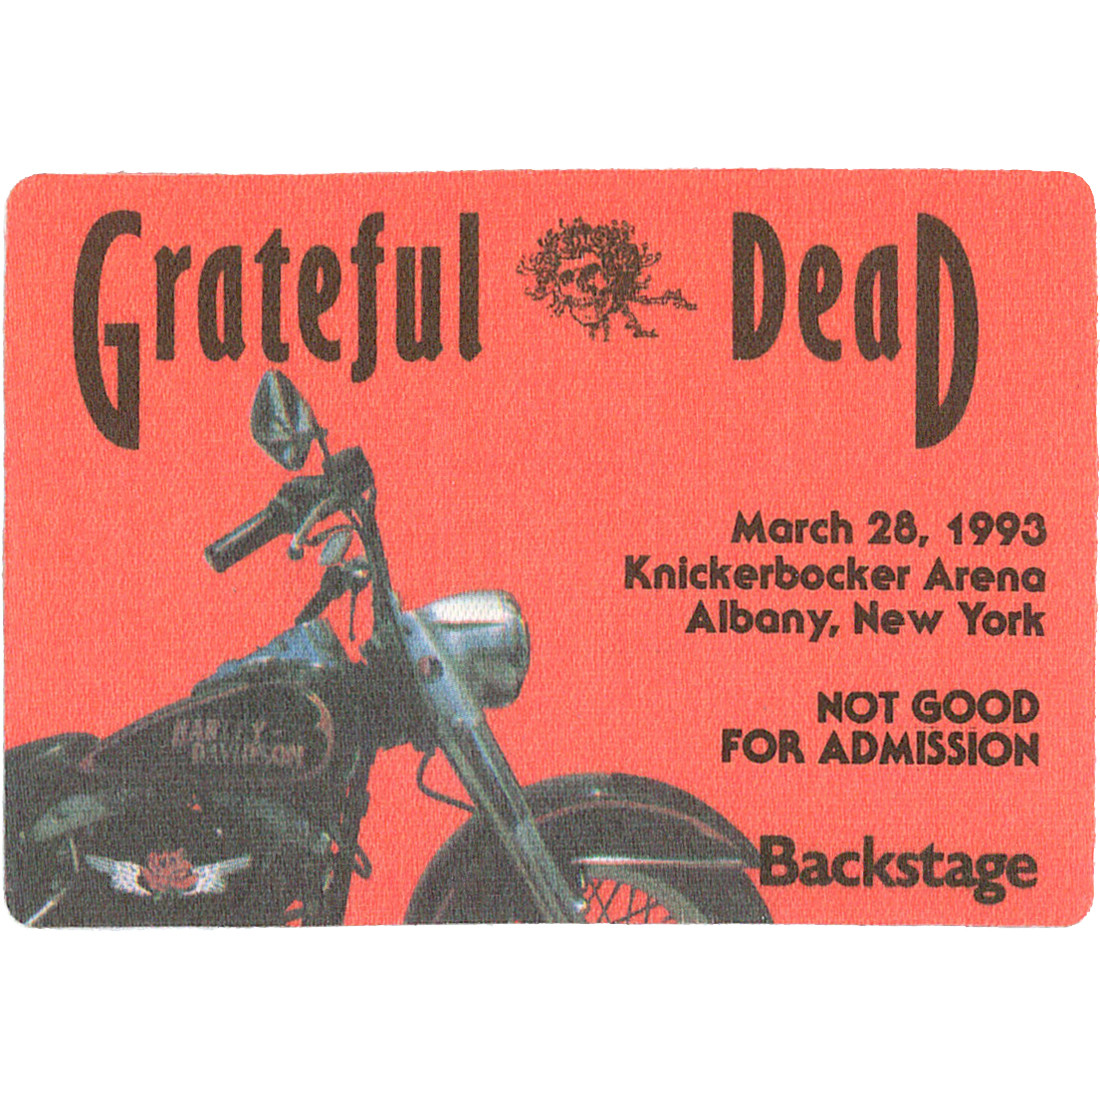 Grateful Dead 1993 03-28 Backstage Pass